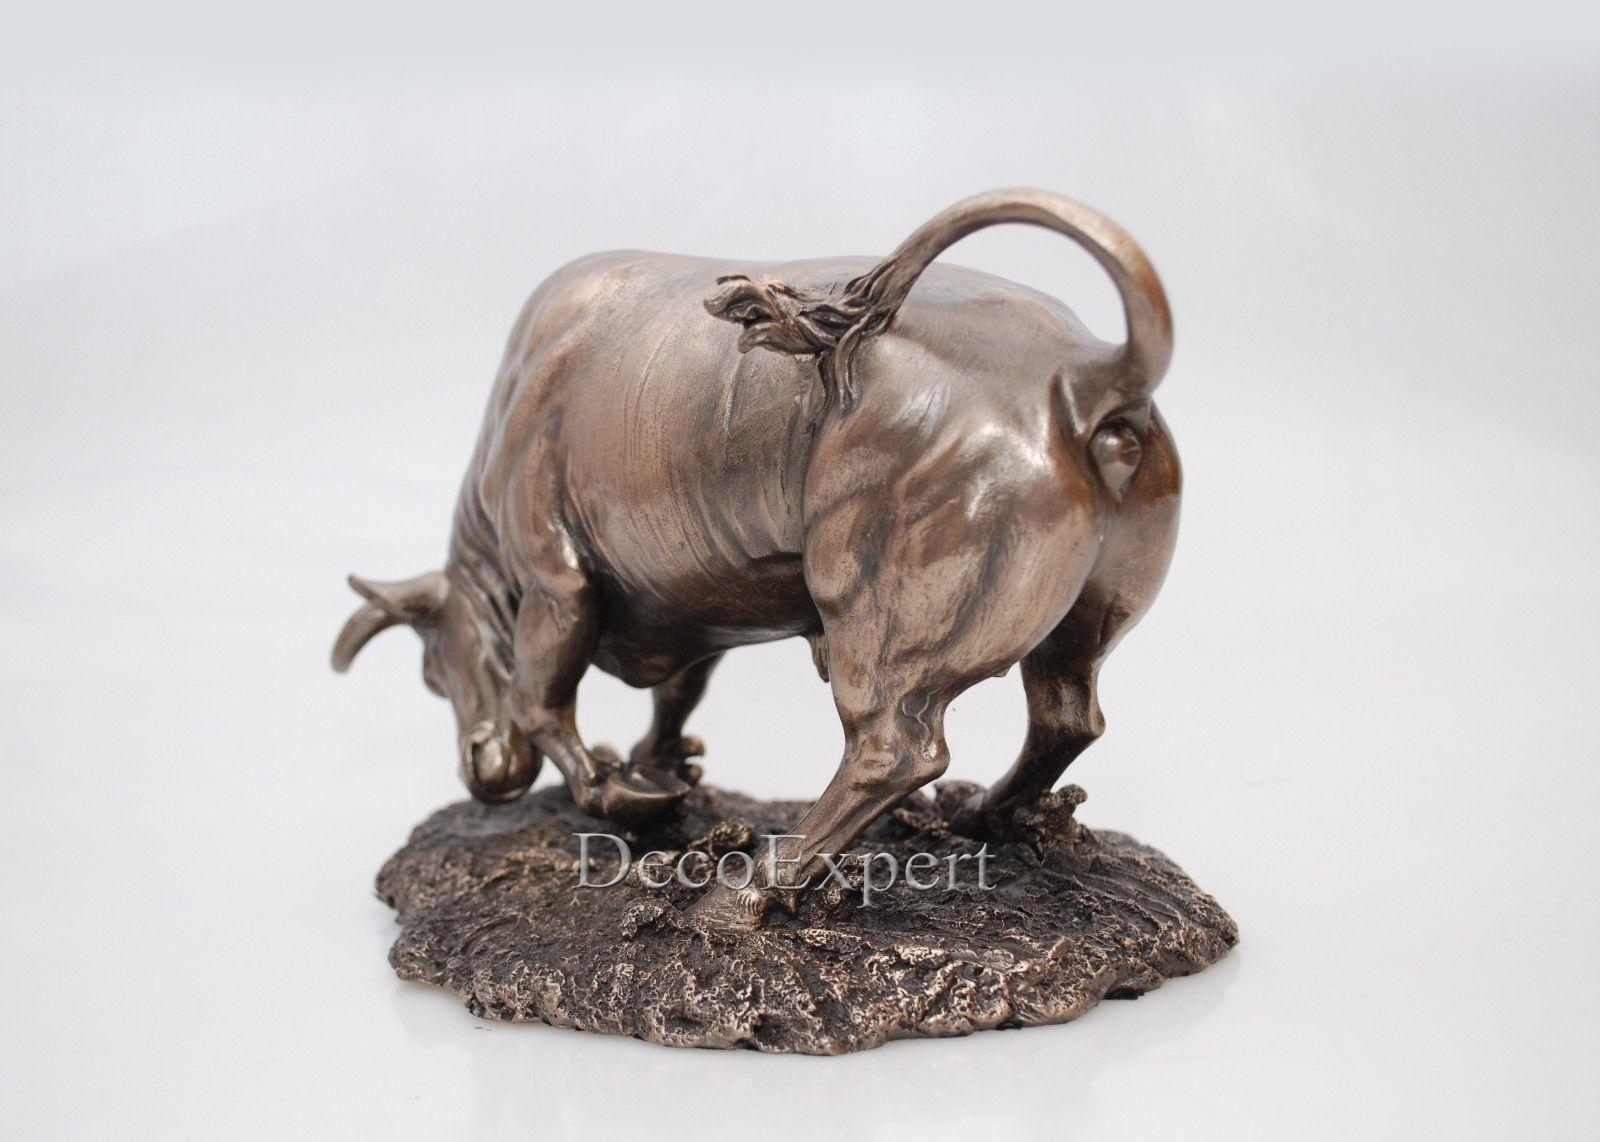 Fighting Bull Spanish bull fighting Charging Bull wall street * * Free Air Shipp